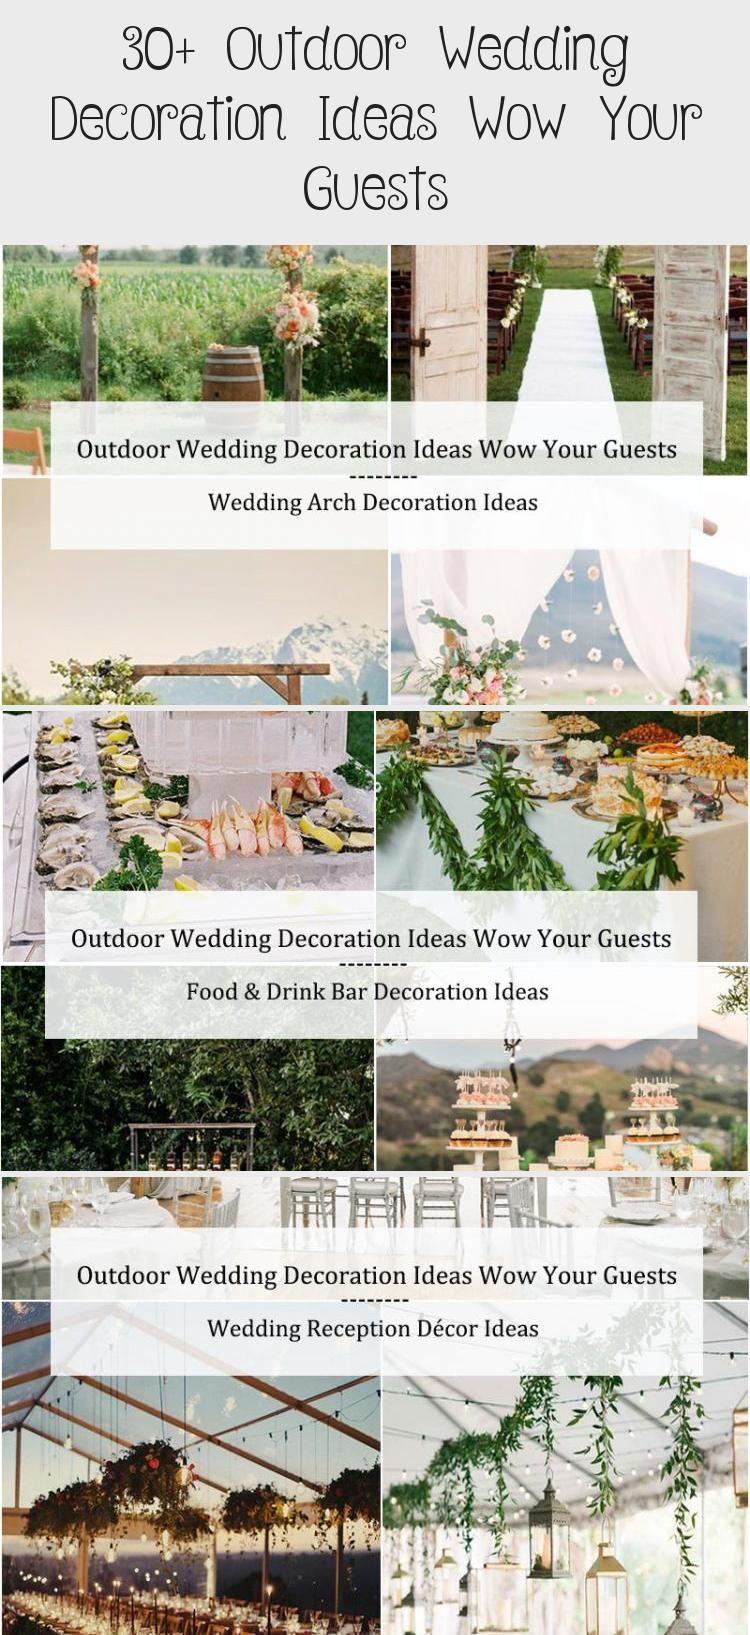 30 Outdoor Wedding Decoration Ideas Wow Your Guests Cheap Wedding Ideas Gardenweddingdi In 2020 Outdoor Wedding Decorations Outdoor Wedding Arch Decoration Wedding